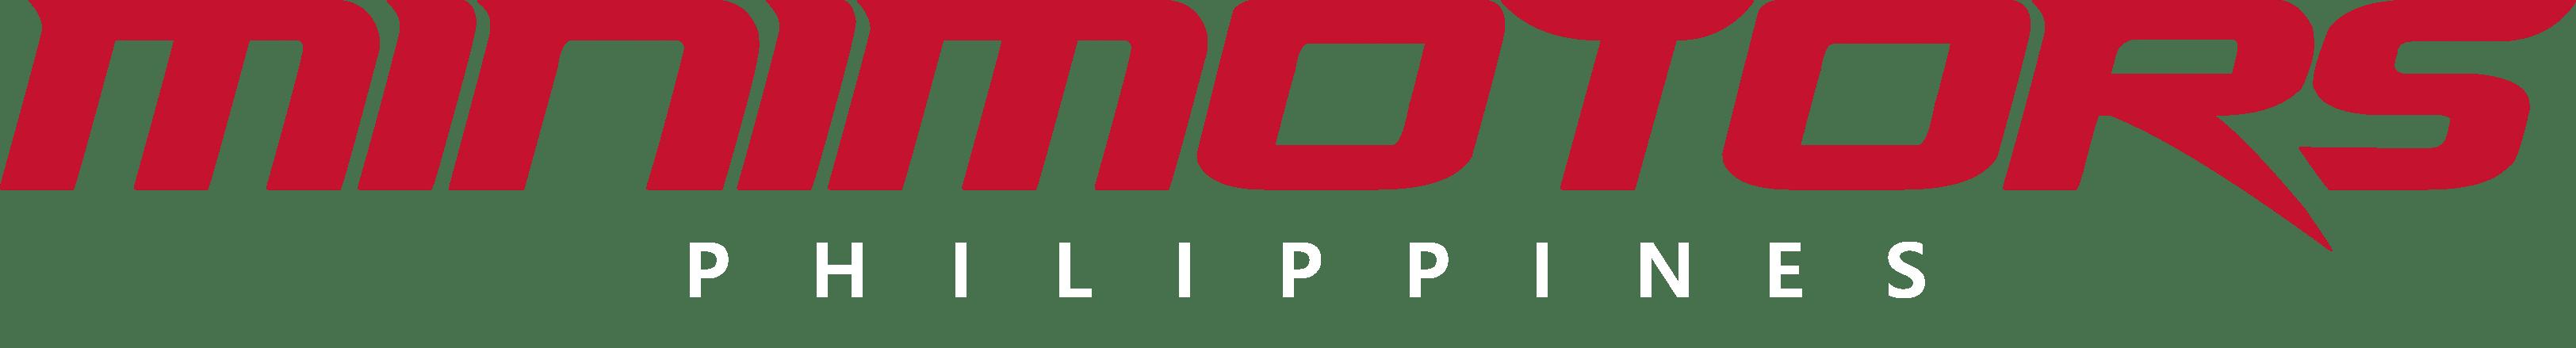 Minimotors Philippines Logo